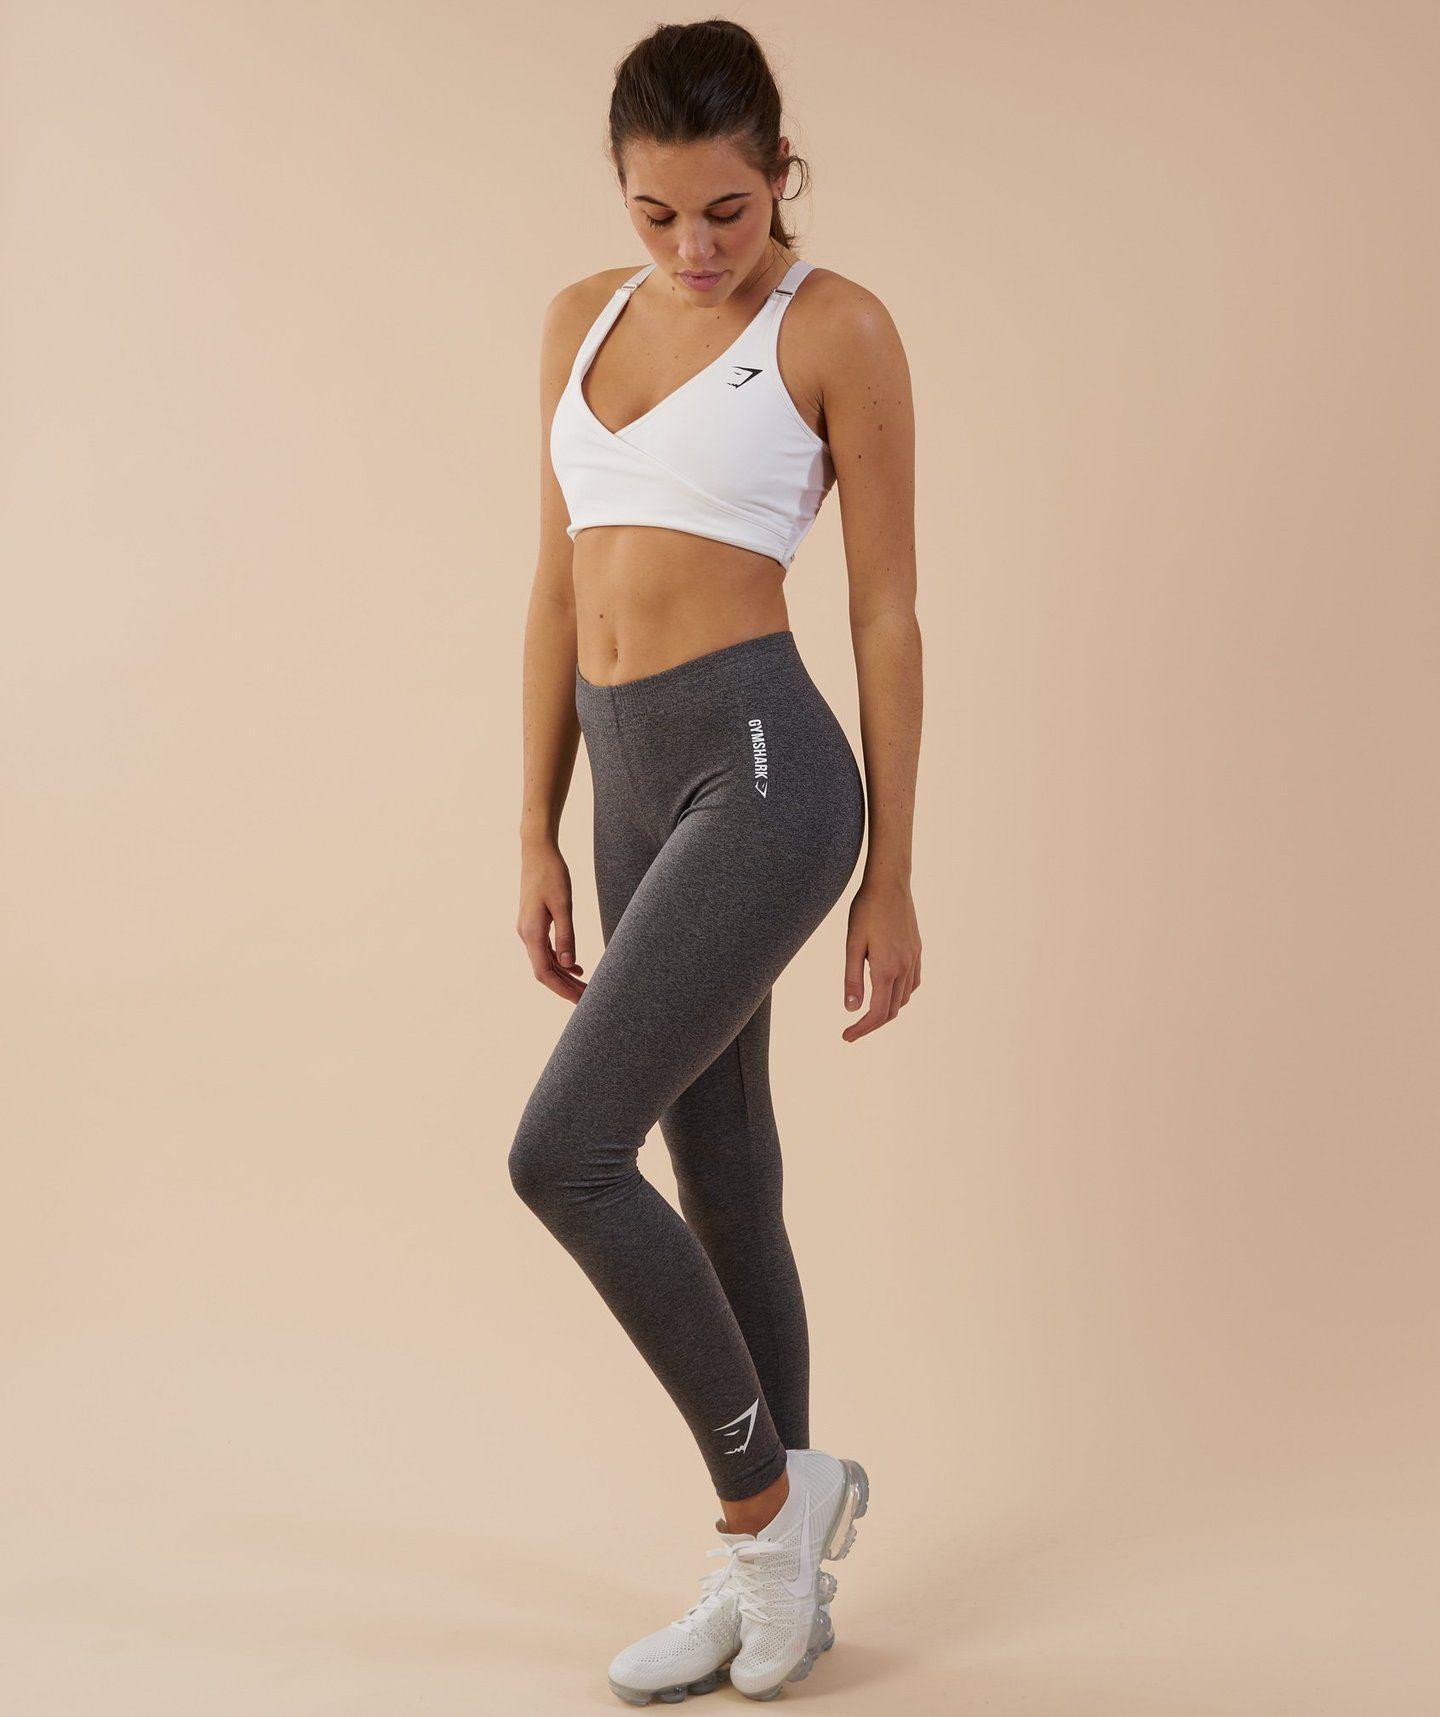 0fbb7d62c83941 Gymshark Ark Jersey Leggings - Charcoal Marl 3 | Workout Style ...